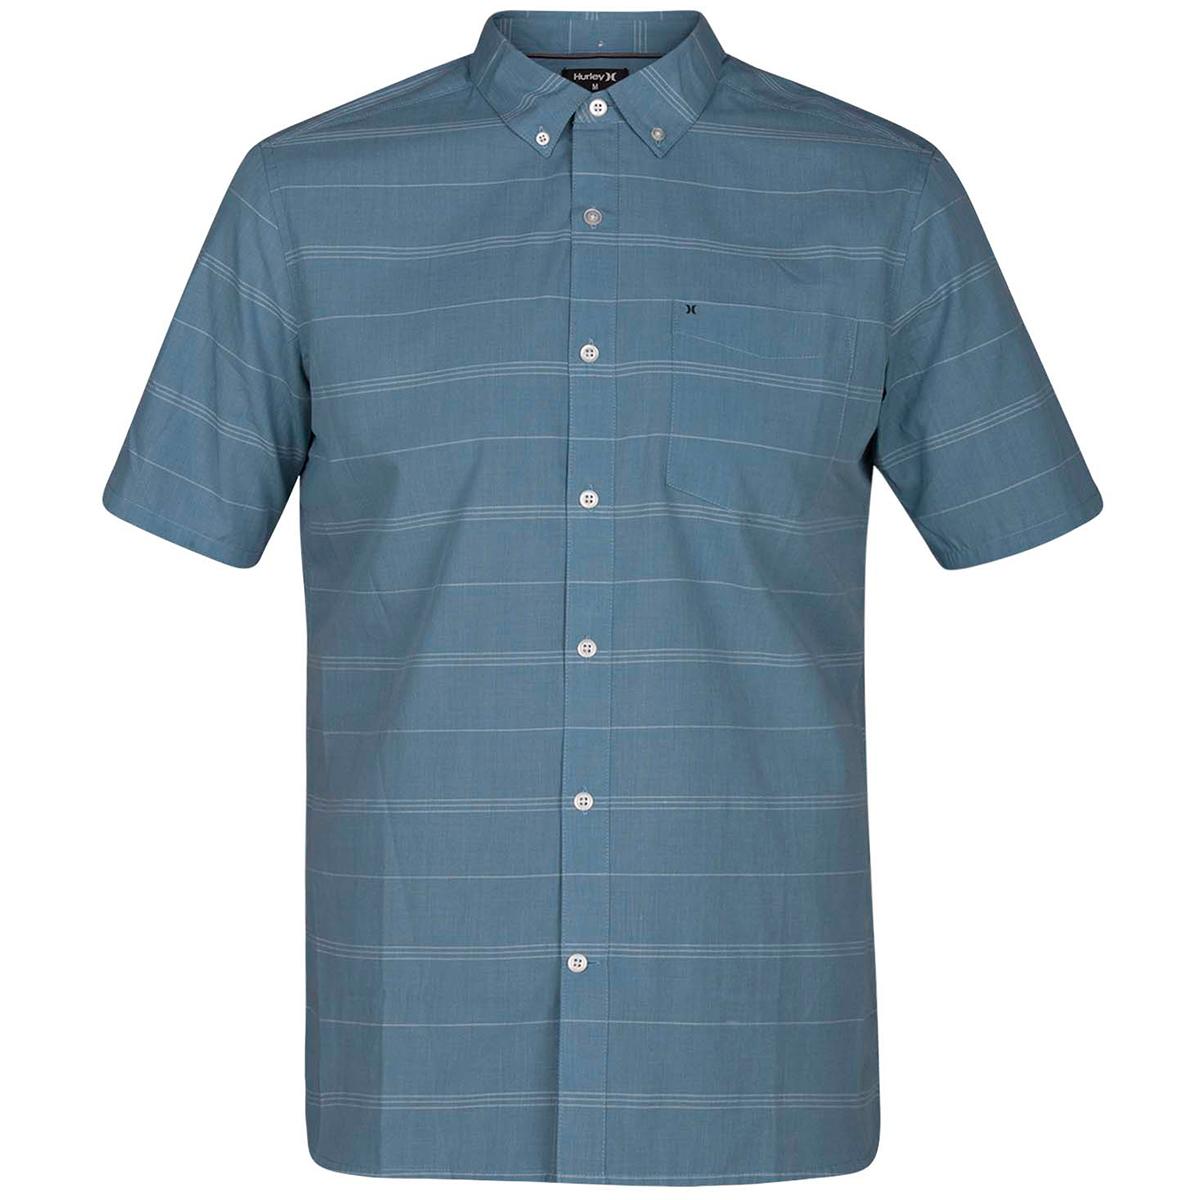 Hurley Men's Dri-Fit Rhythm Short-Sleeve Shirt - Green, M